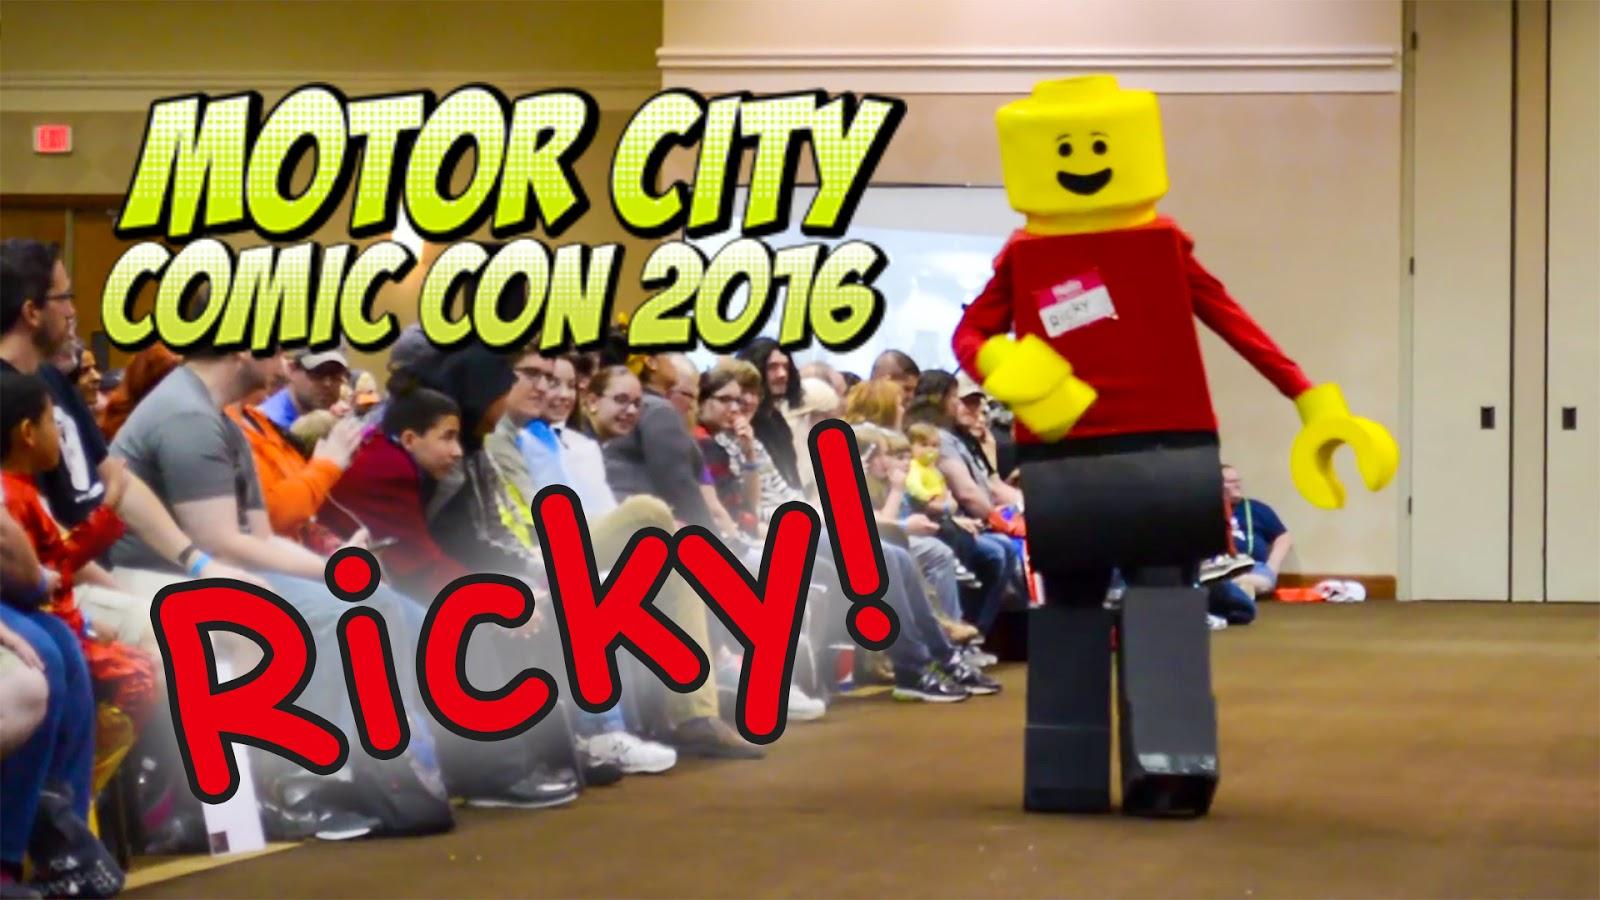 Bricks 39 n blocks ricky at motor city comic con 2016 for Motor city comic con